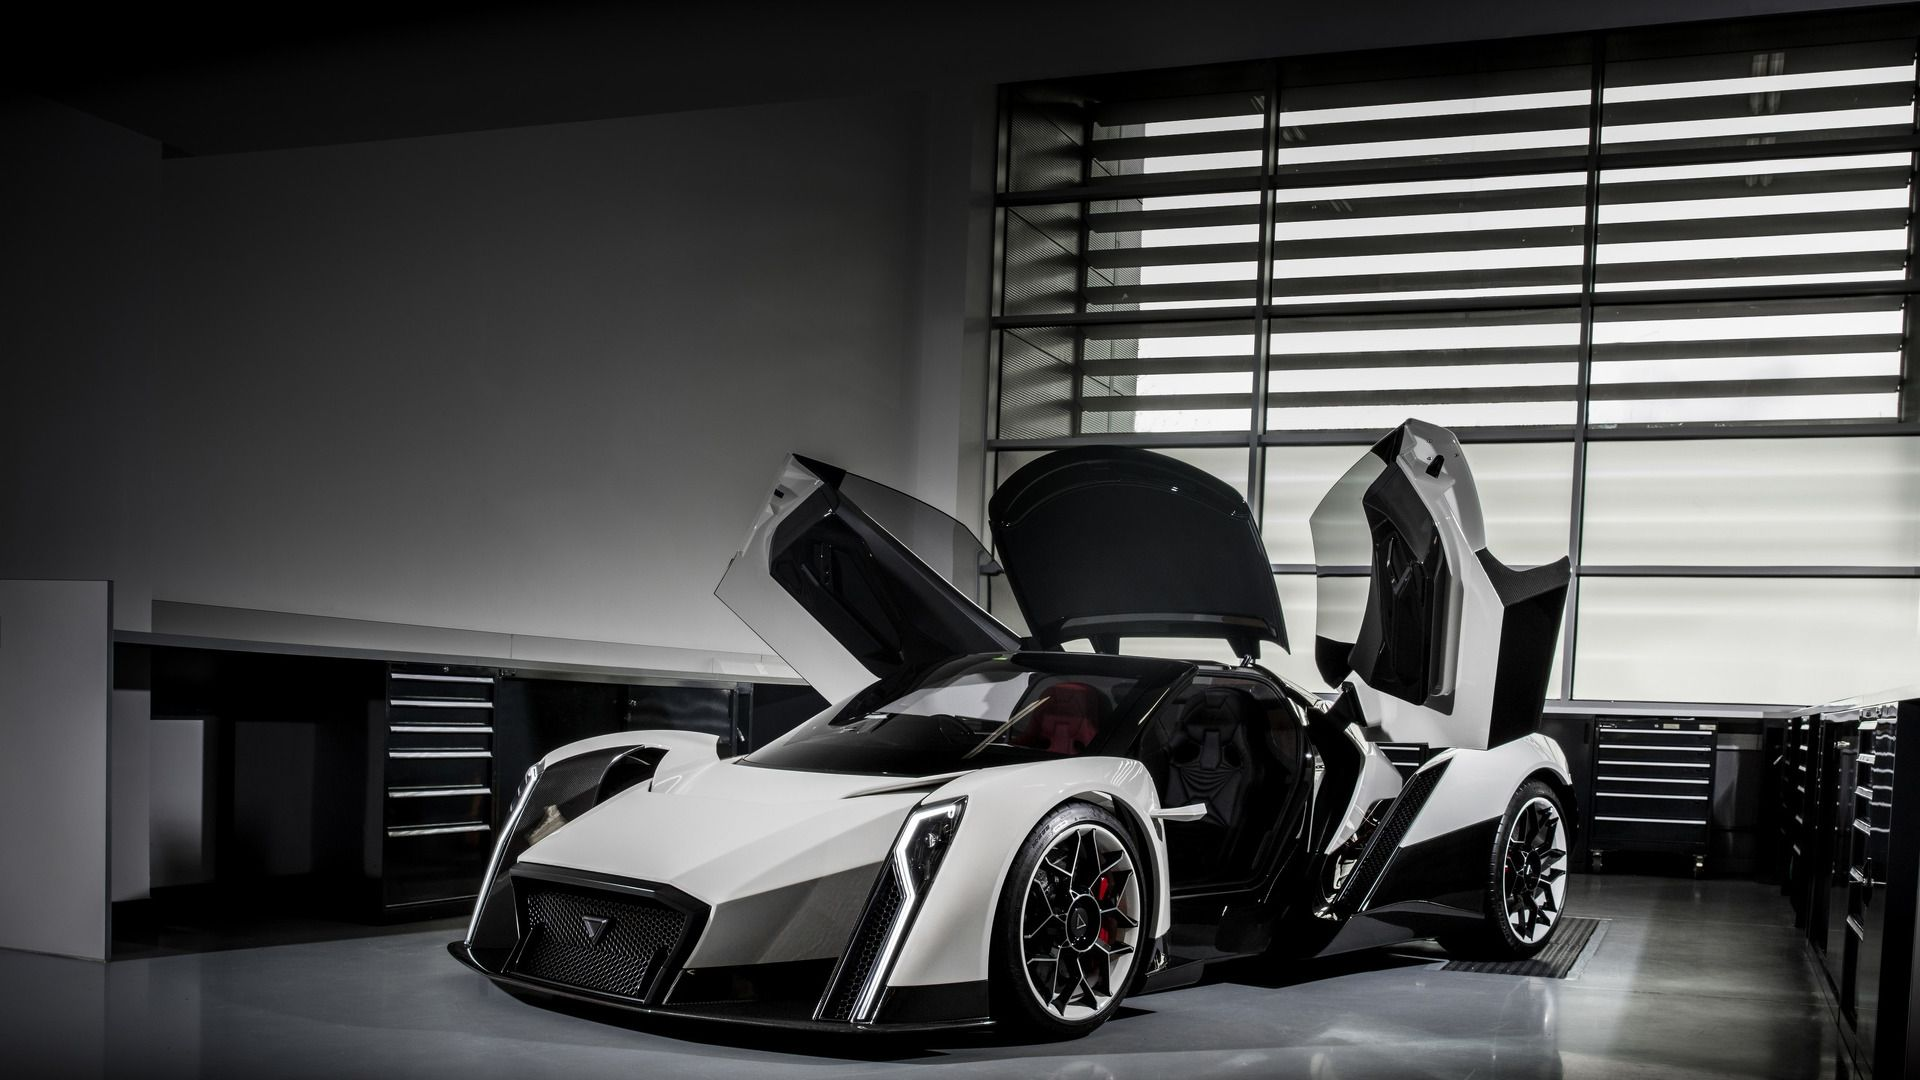 Bugatti type 57 t concept is the touring car of our dreams sport cars supercars pinterest bugatti bugatti type 57 and supercars